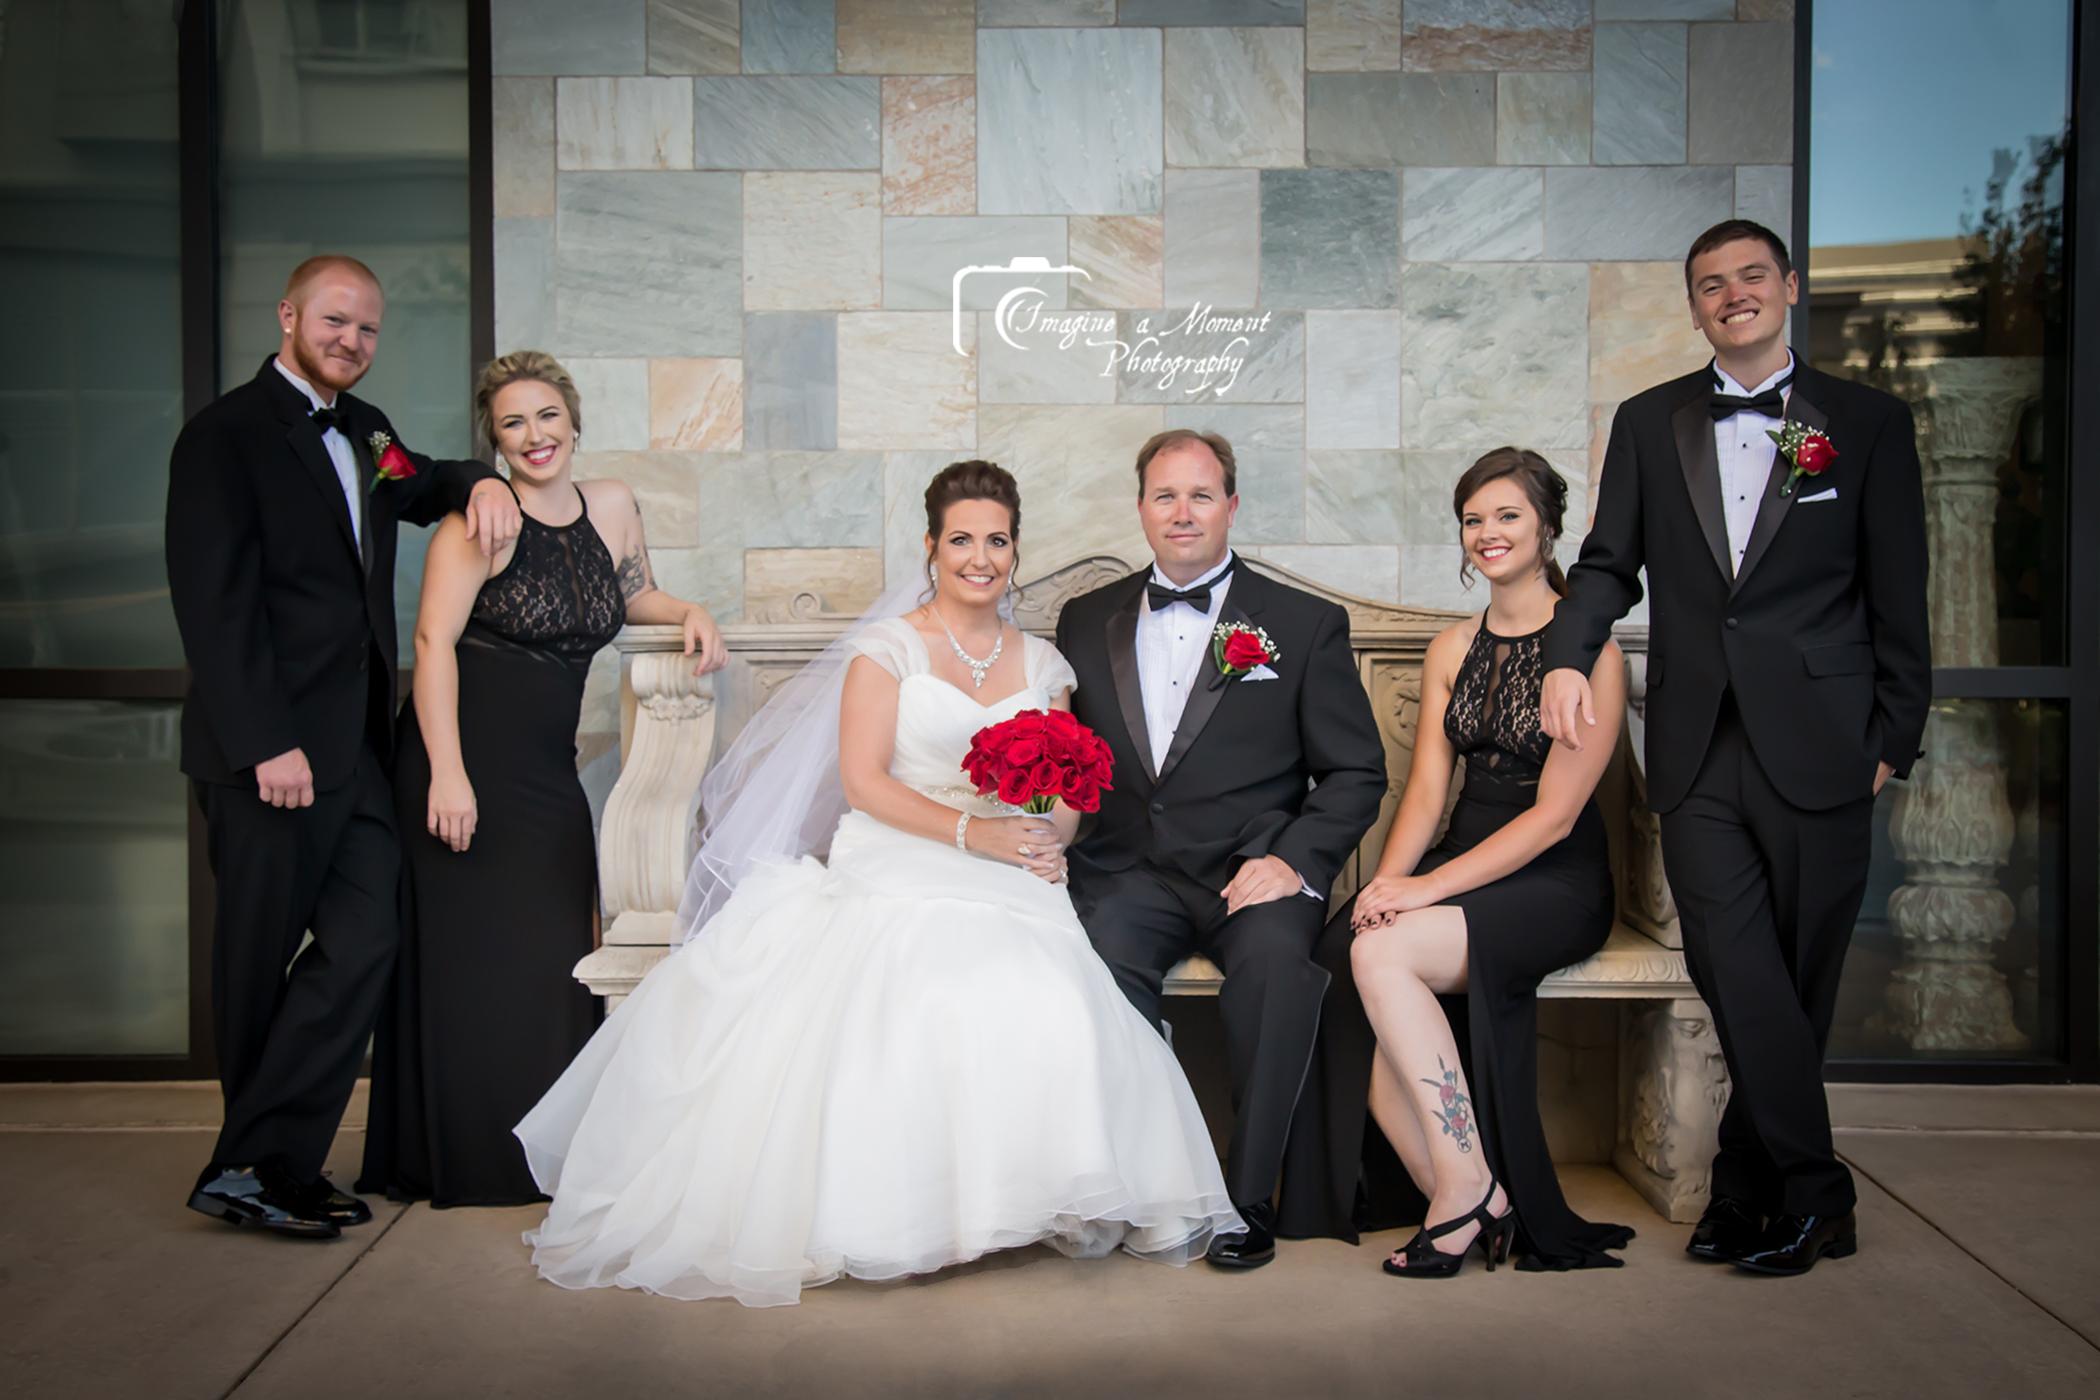 Miller Wedding 20173 WM.jpg